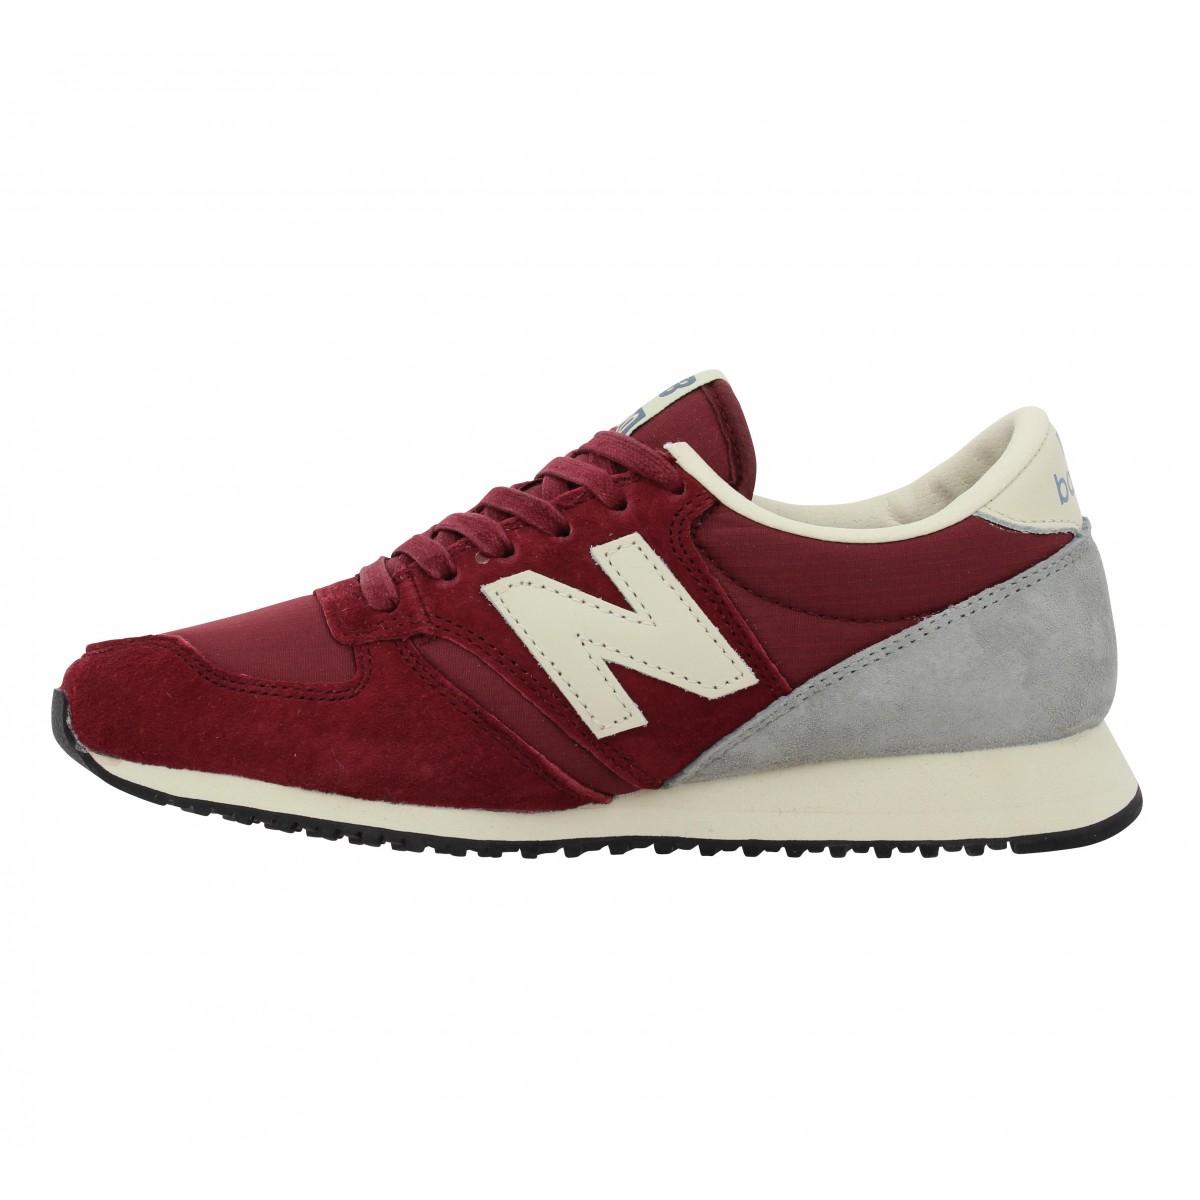 new balance bordeaux sneakers